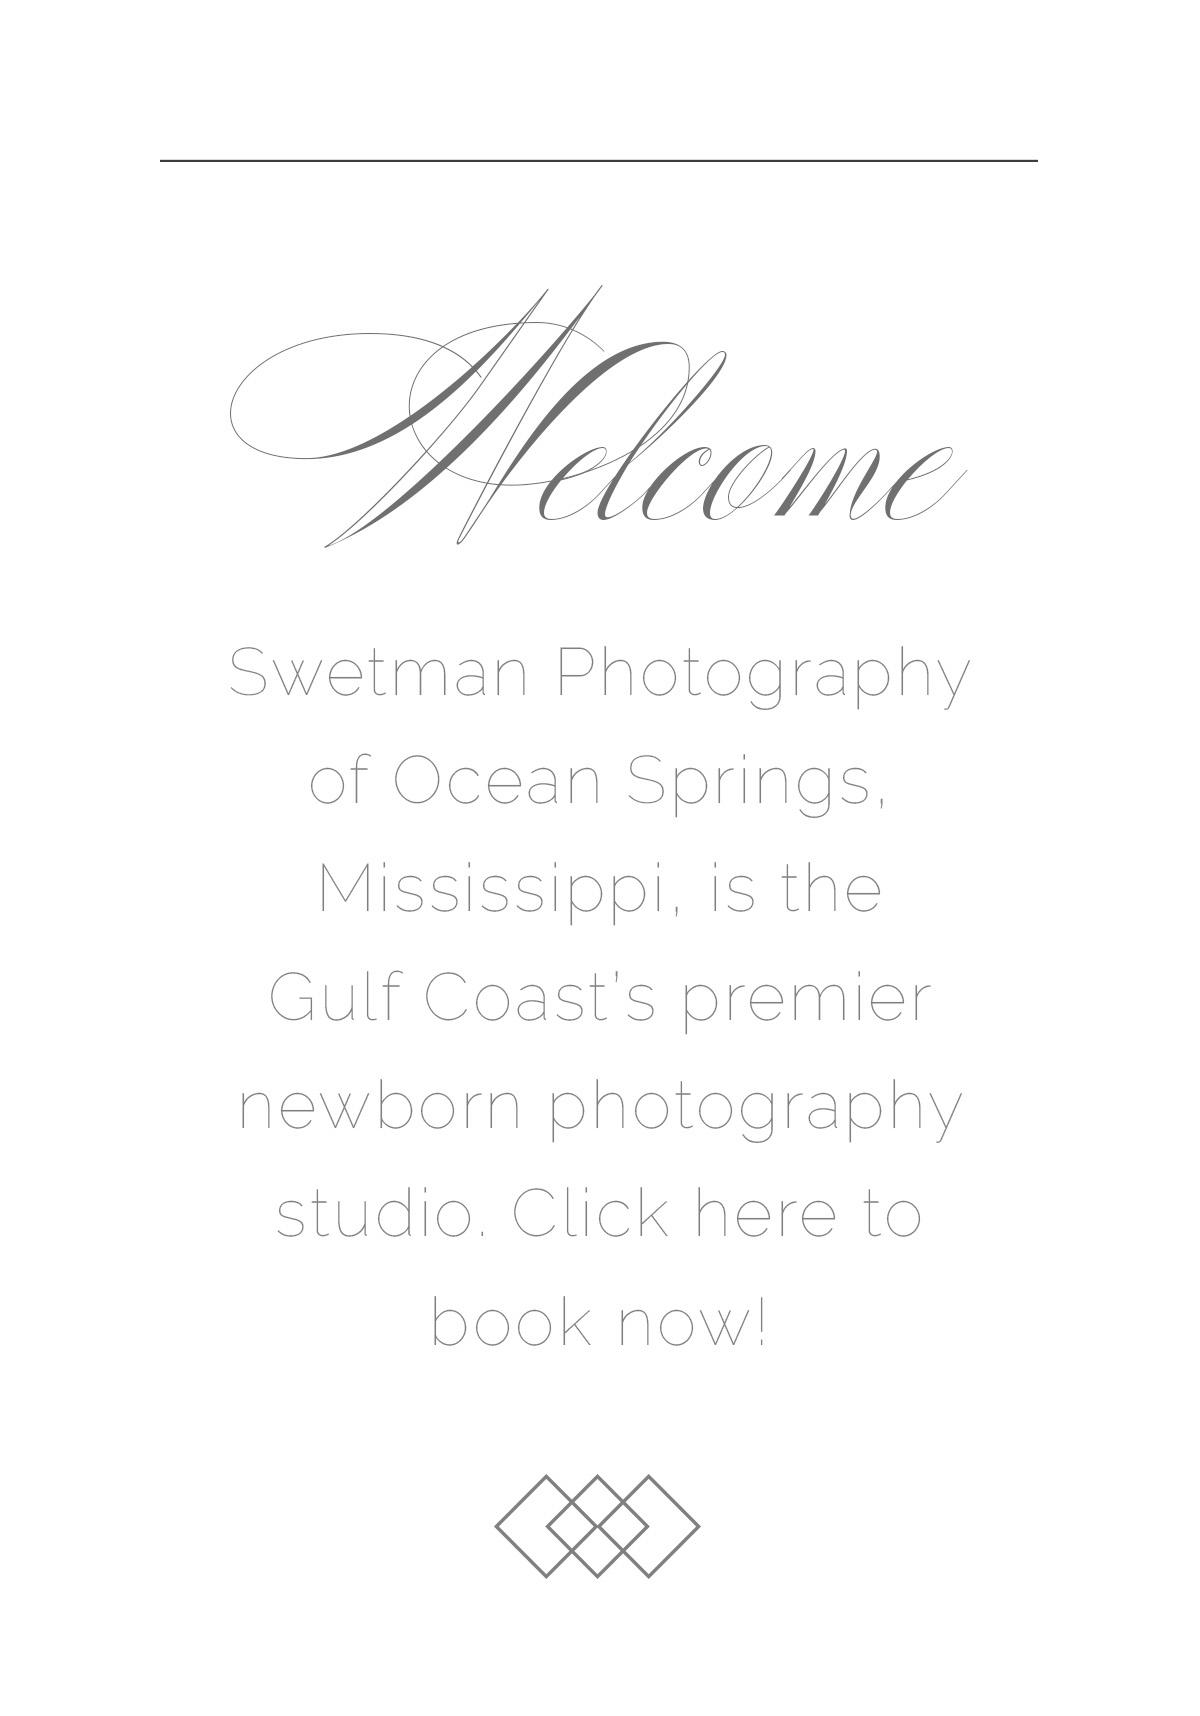 swetman-photography-ocean-springs-newborn-photographer-mississippi.jpg